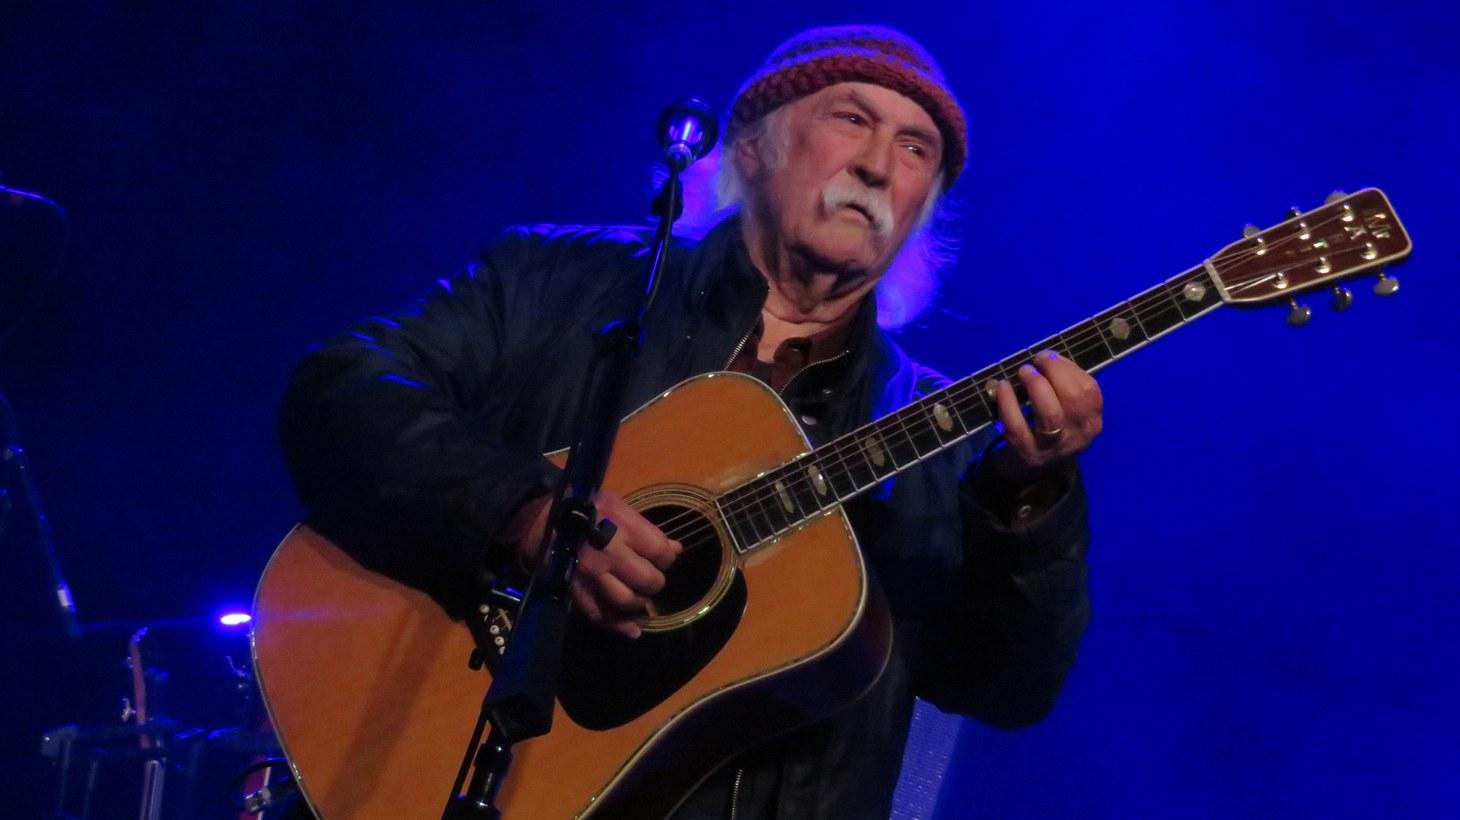 David Crosby performing live in Deurne, Belgium.